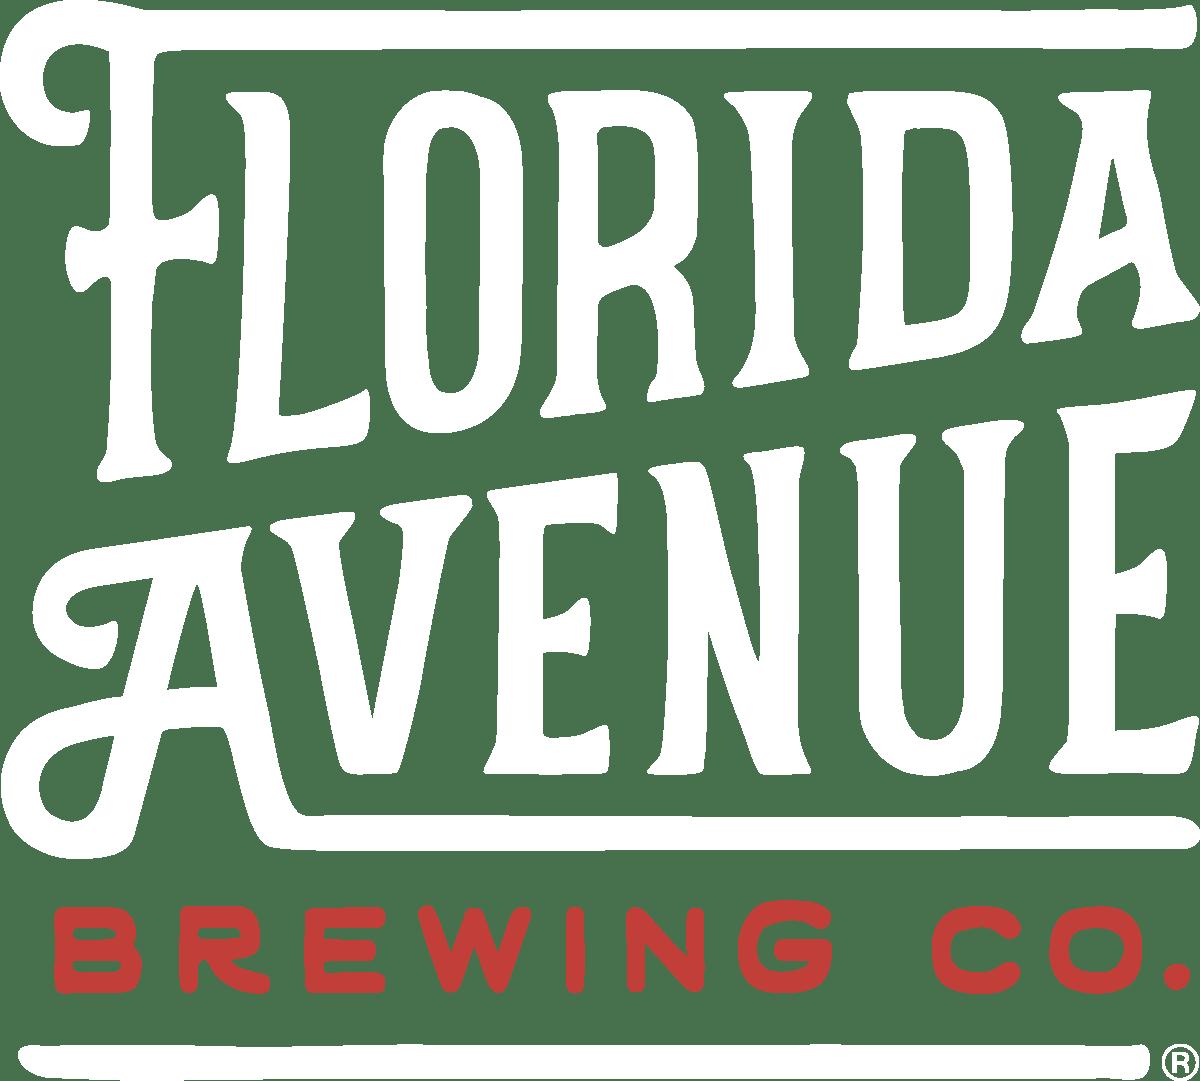 Old Florida Avenue Logo